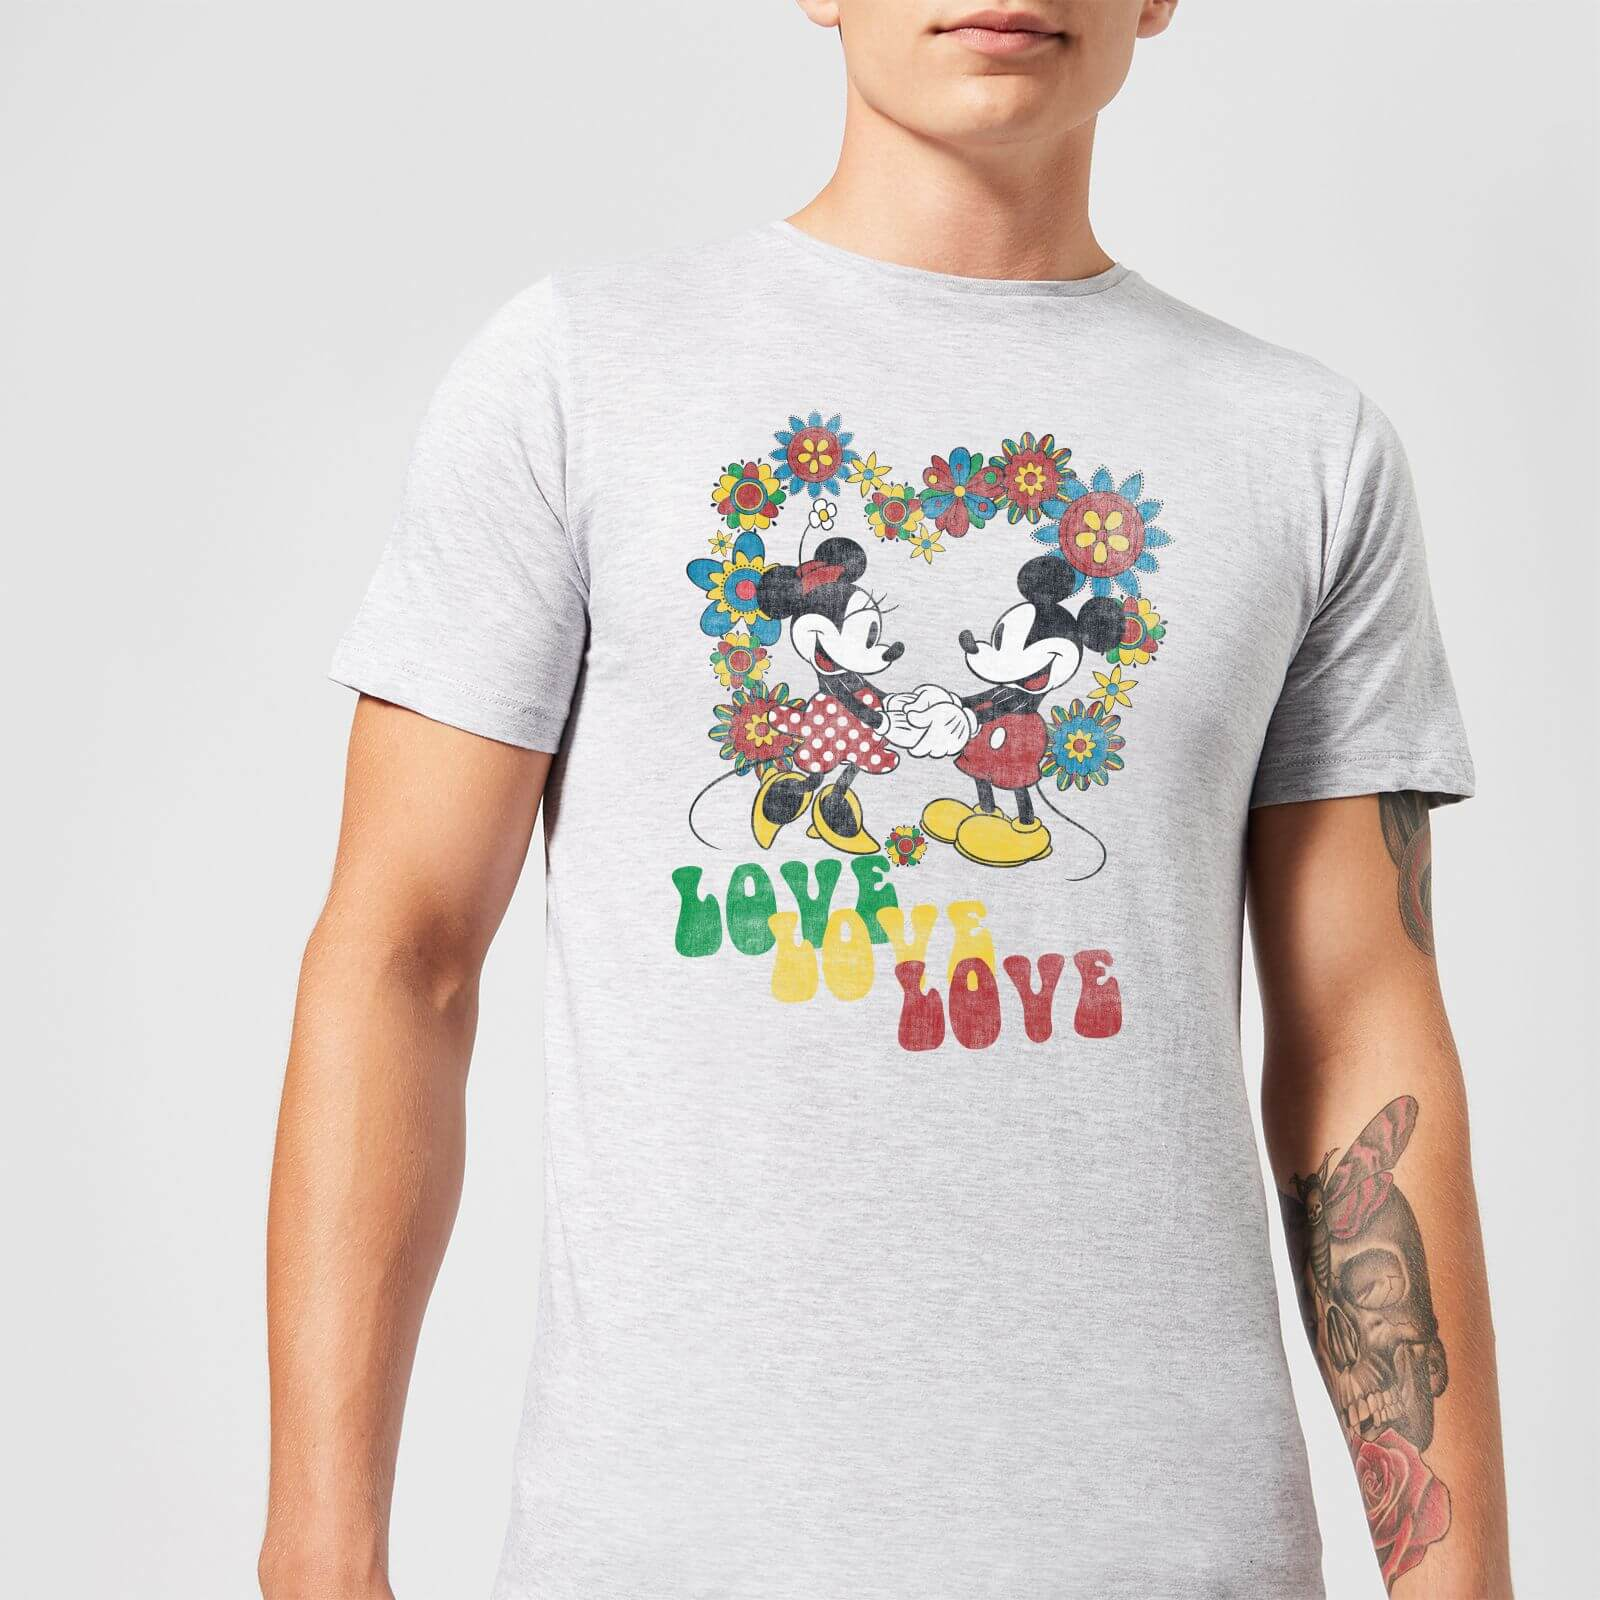 Disney Disney Mickey Mouse Hippie Love T-Shirt - Grey - 4XL - Grey